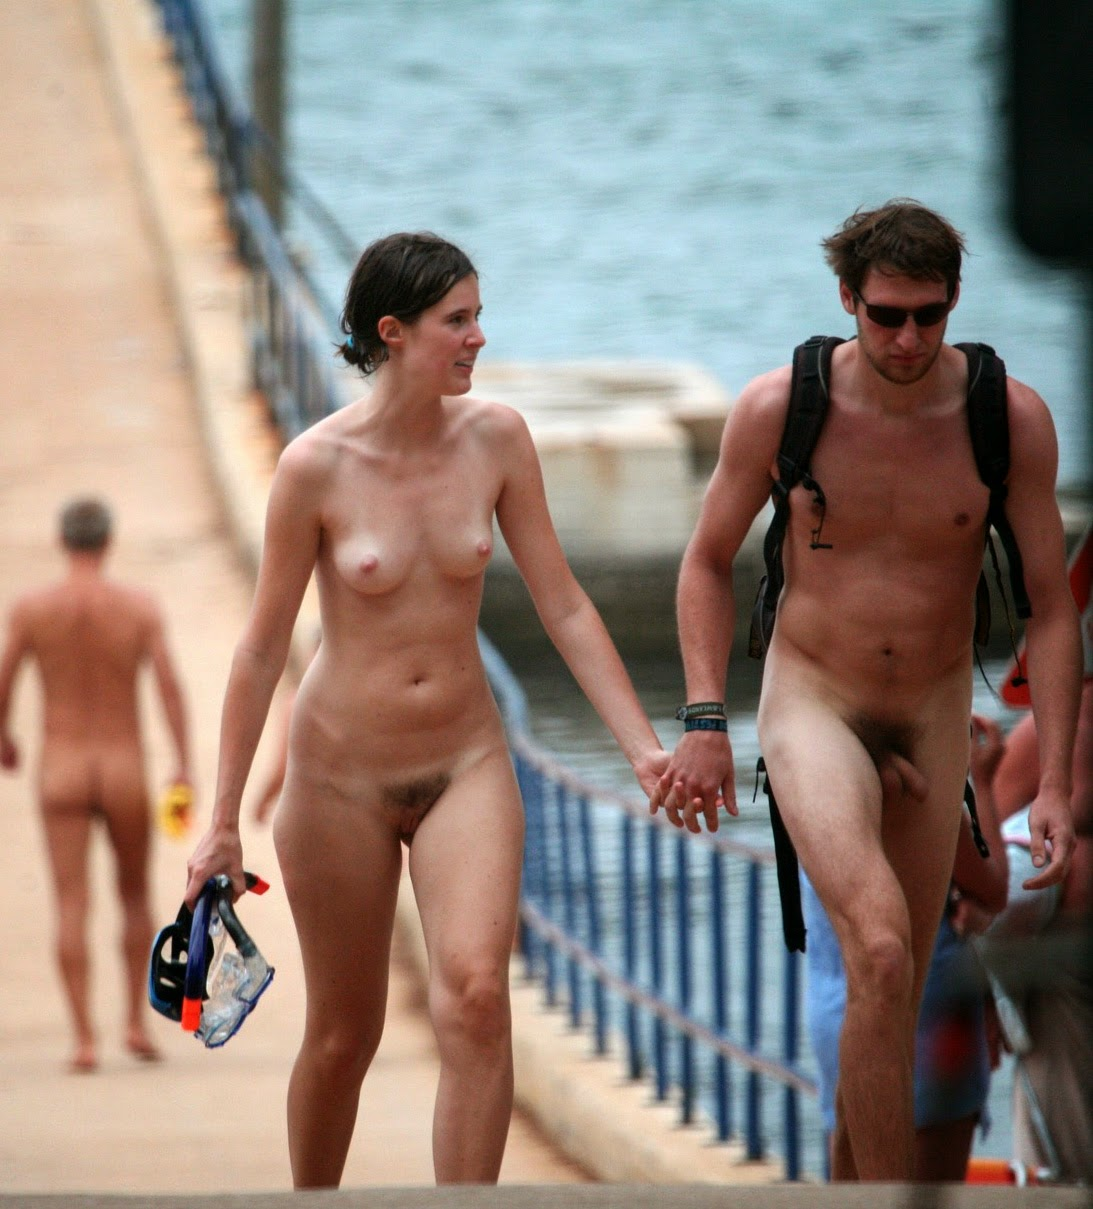 Something Nudist camp nude all